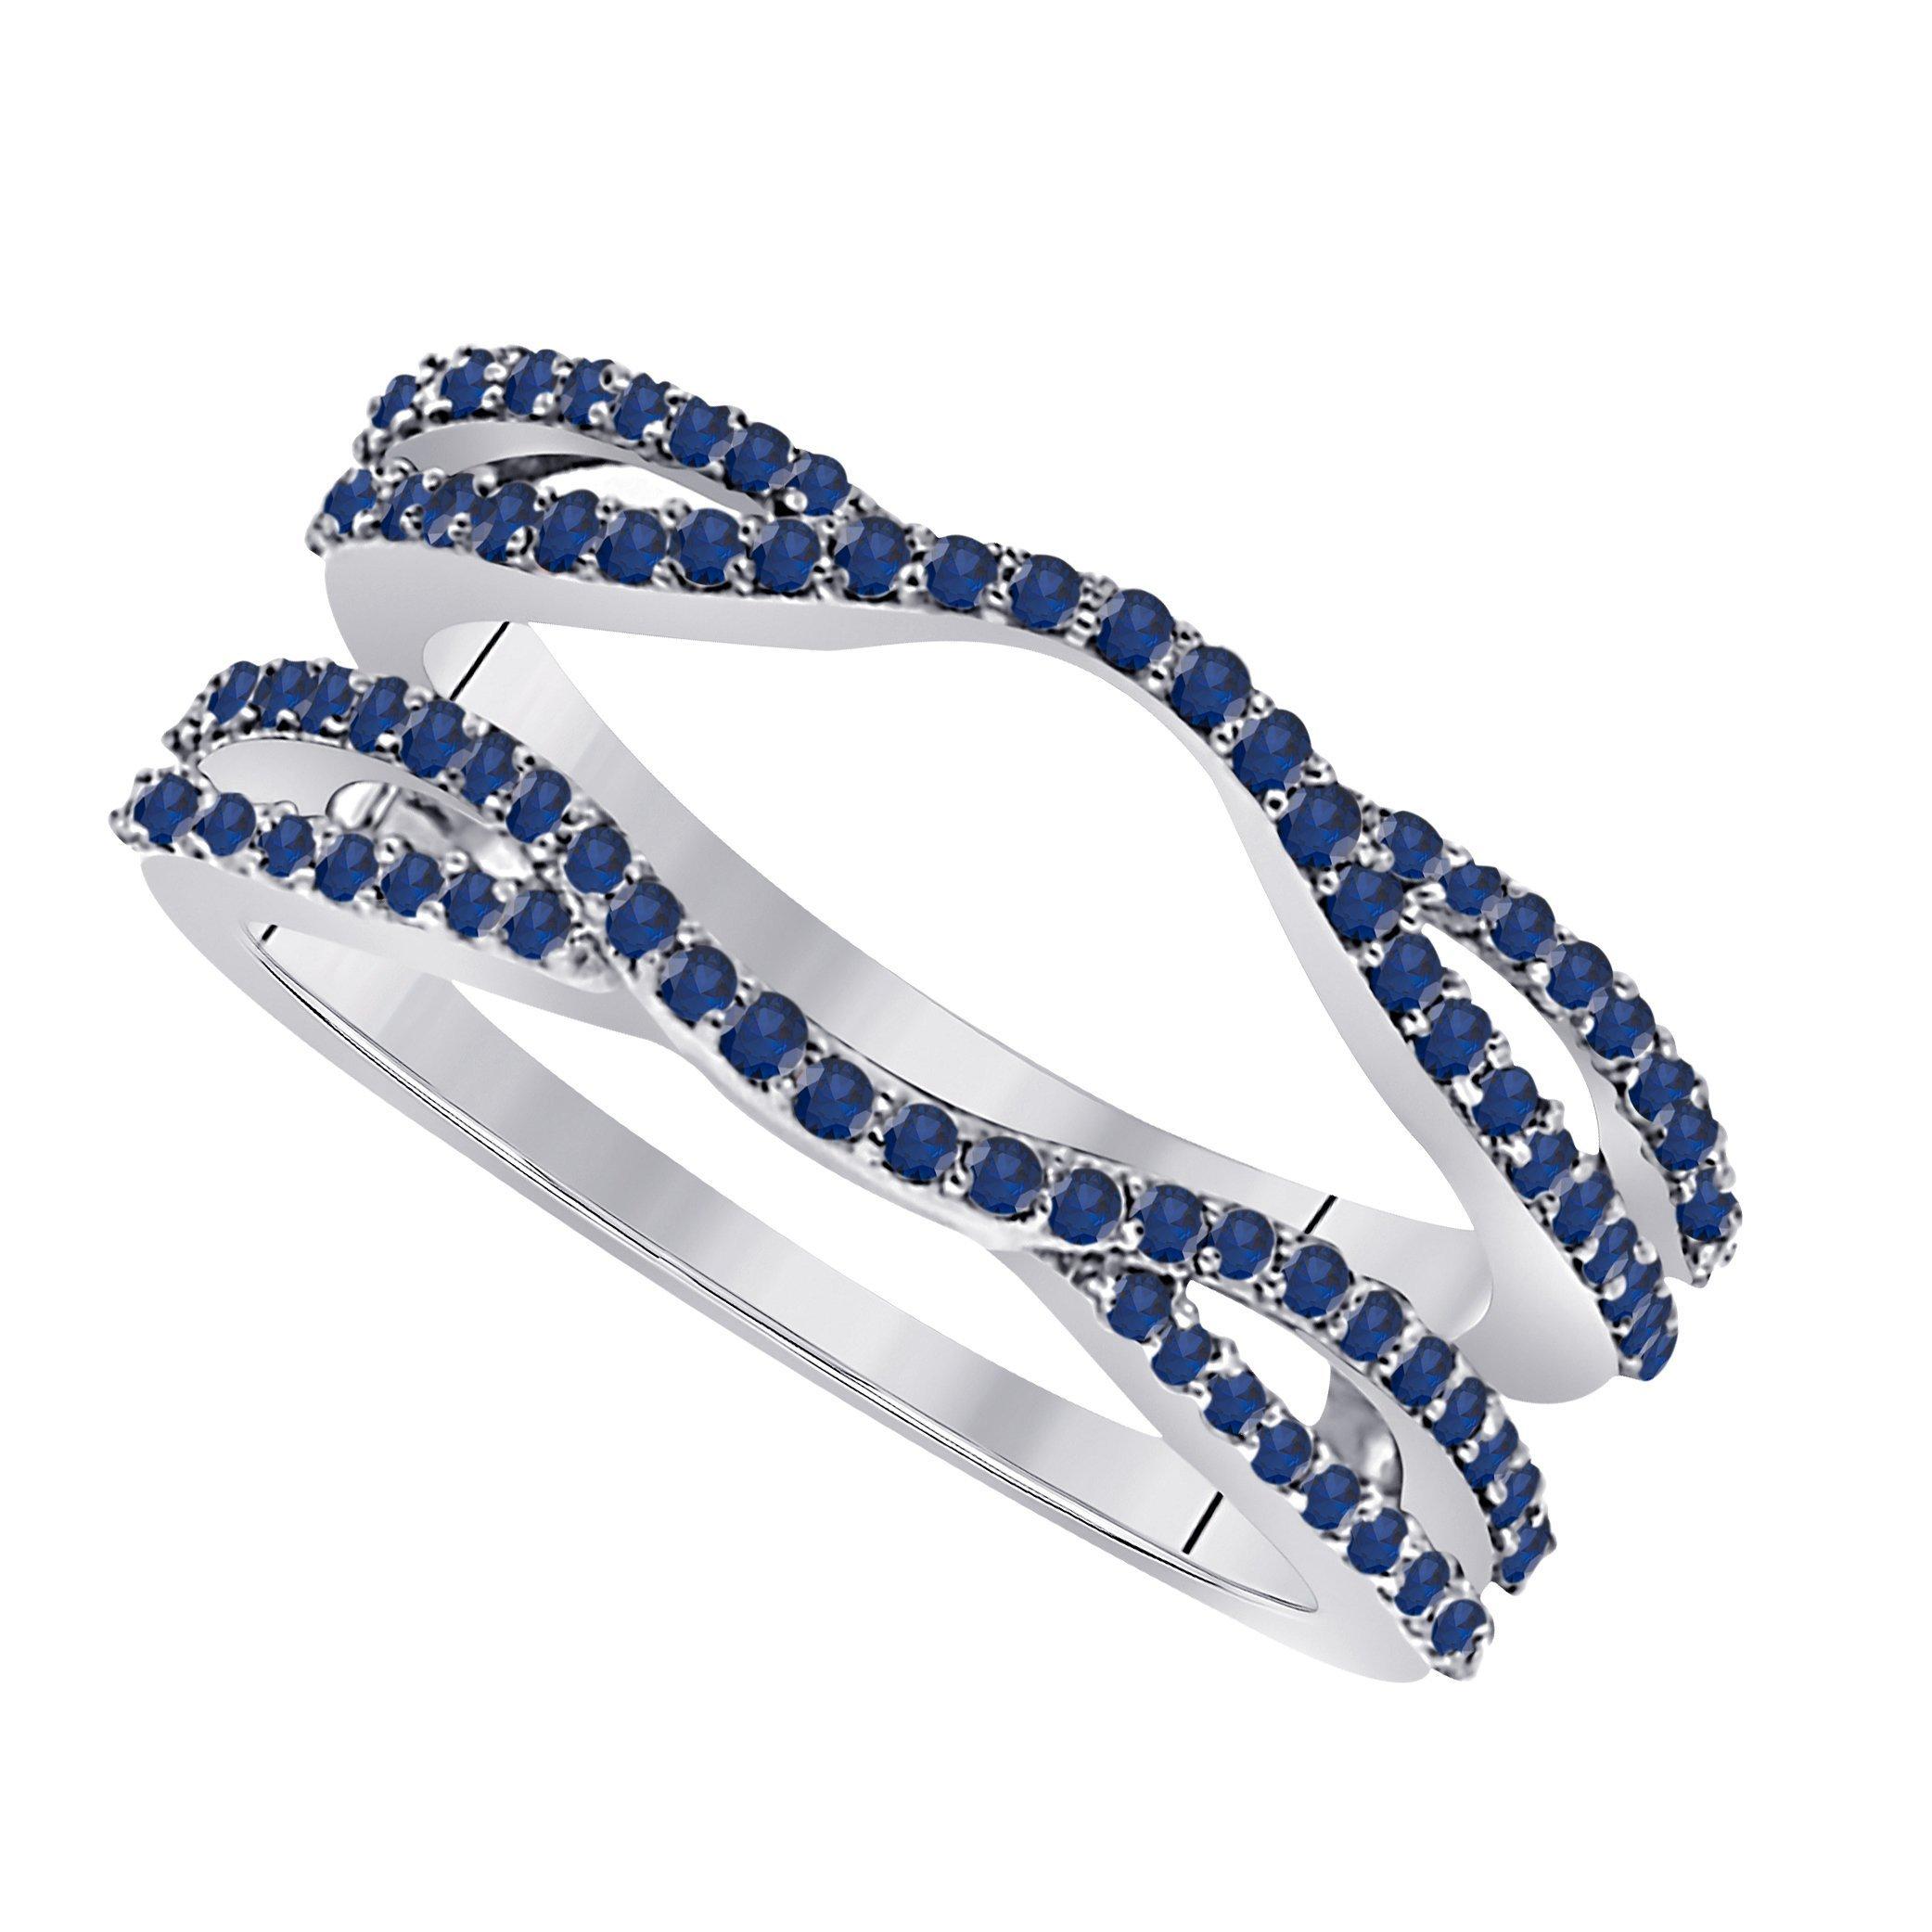 Star Retail 1/2 Ct 14K White Gold Finish Round Cut Lab Created Blue Sapphire Ladies Anniversary Wedding Band Enhancer Guard Double Chevron Ring